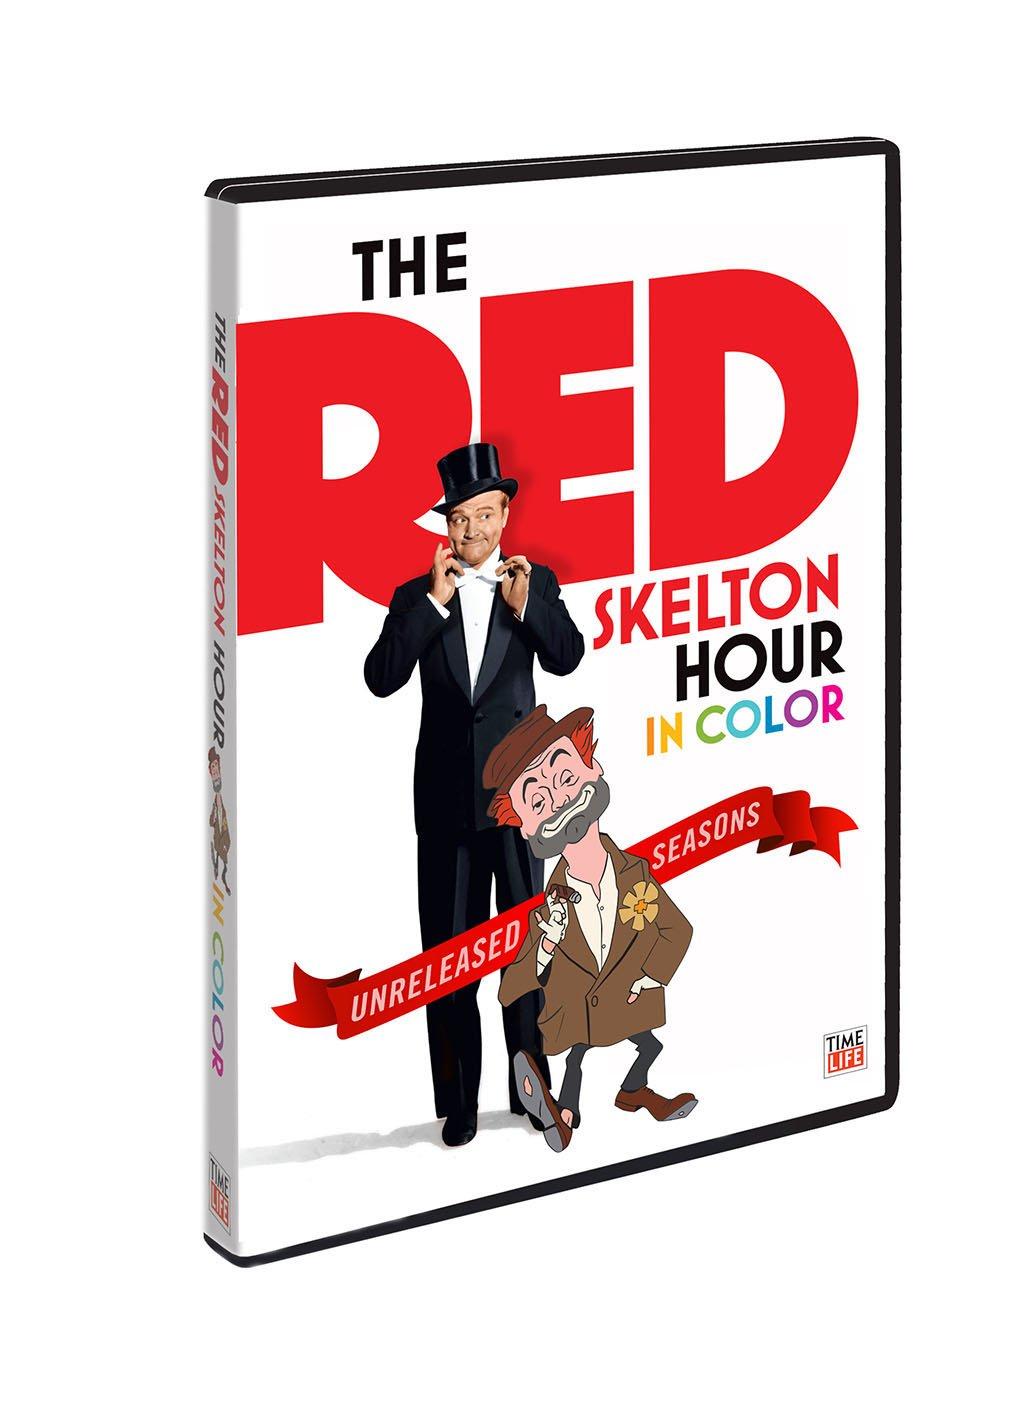 The Red Skelton Hour: In Color: Unreleased Seasons